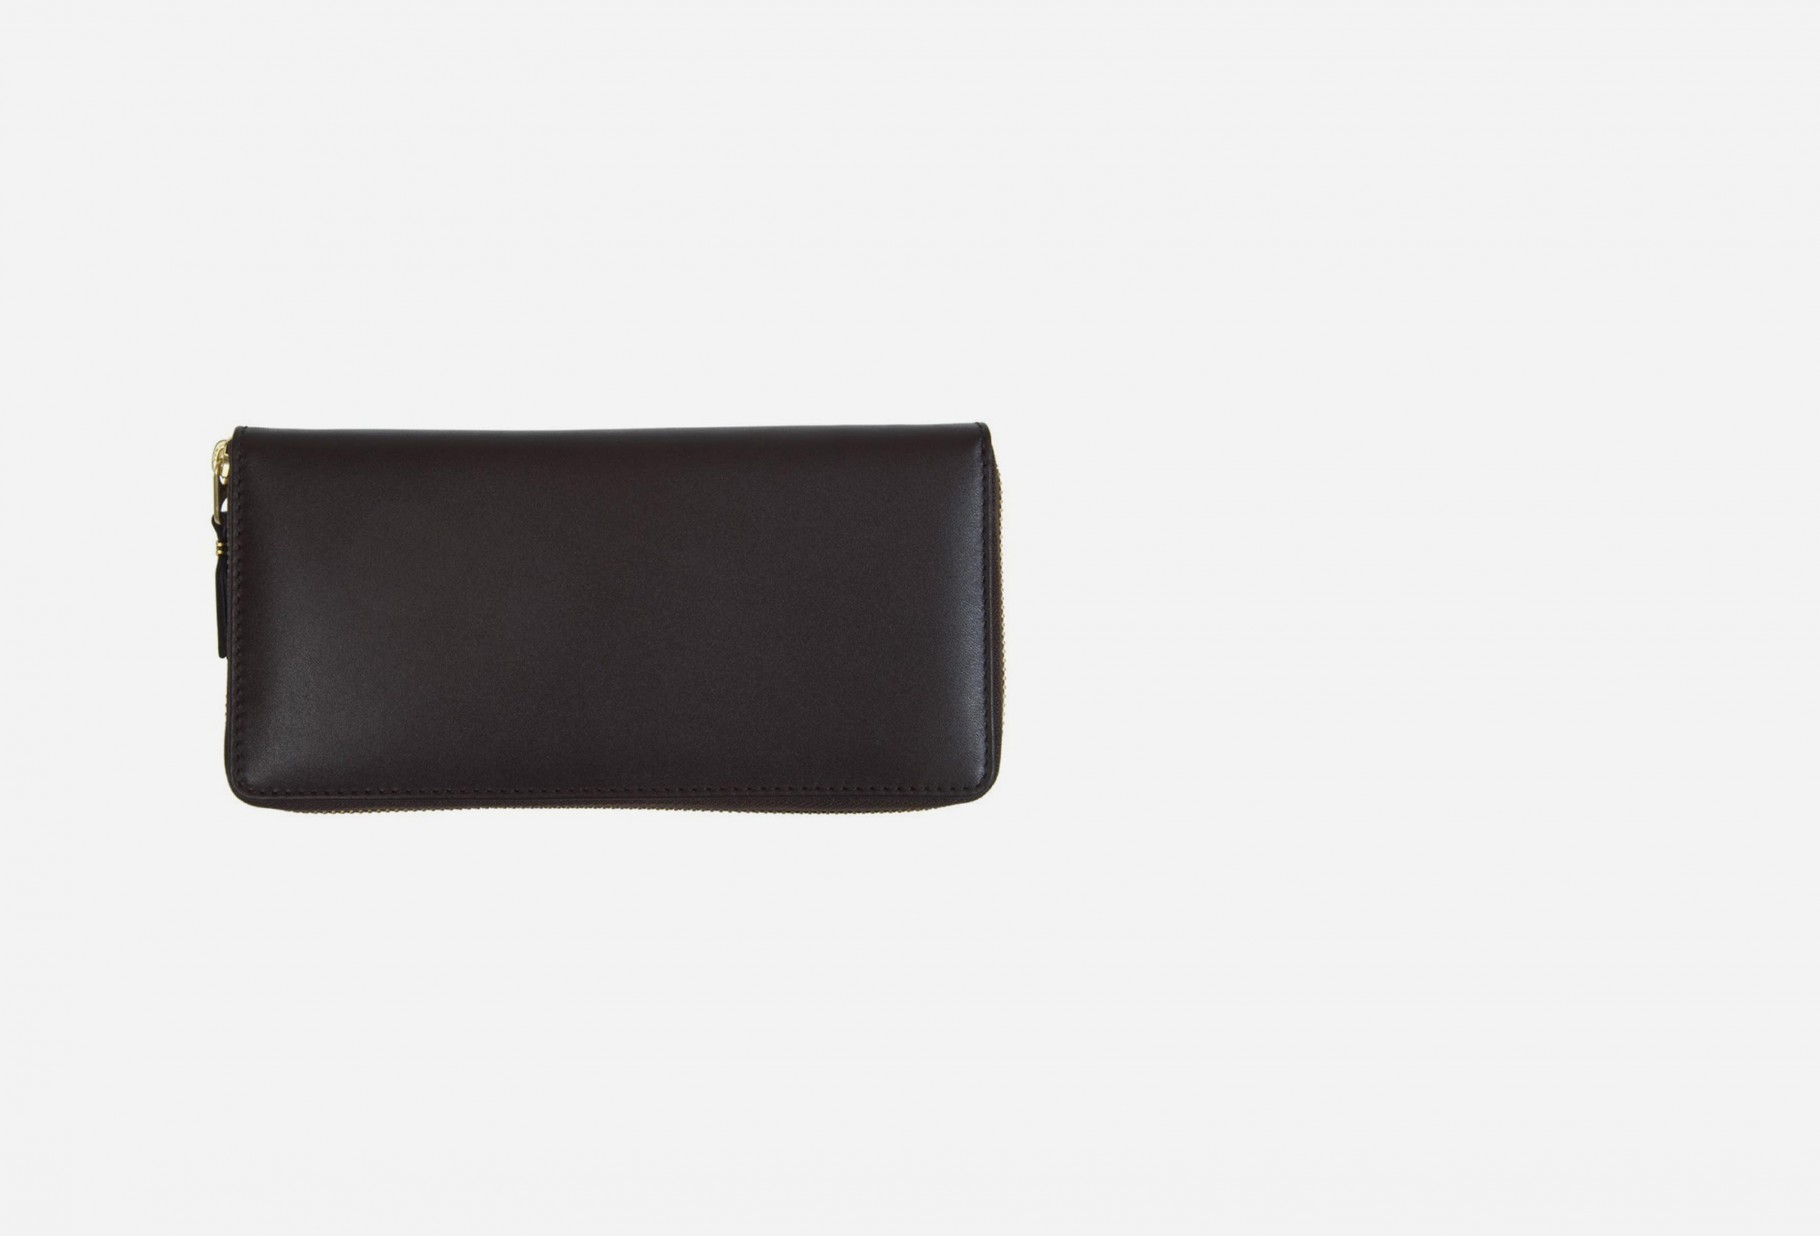 COMME DES GARÇONS WALLETS / Cdg leather wallet classic Sa0110 brown